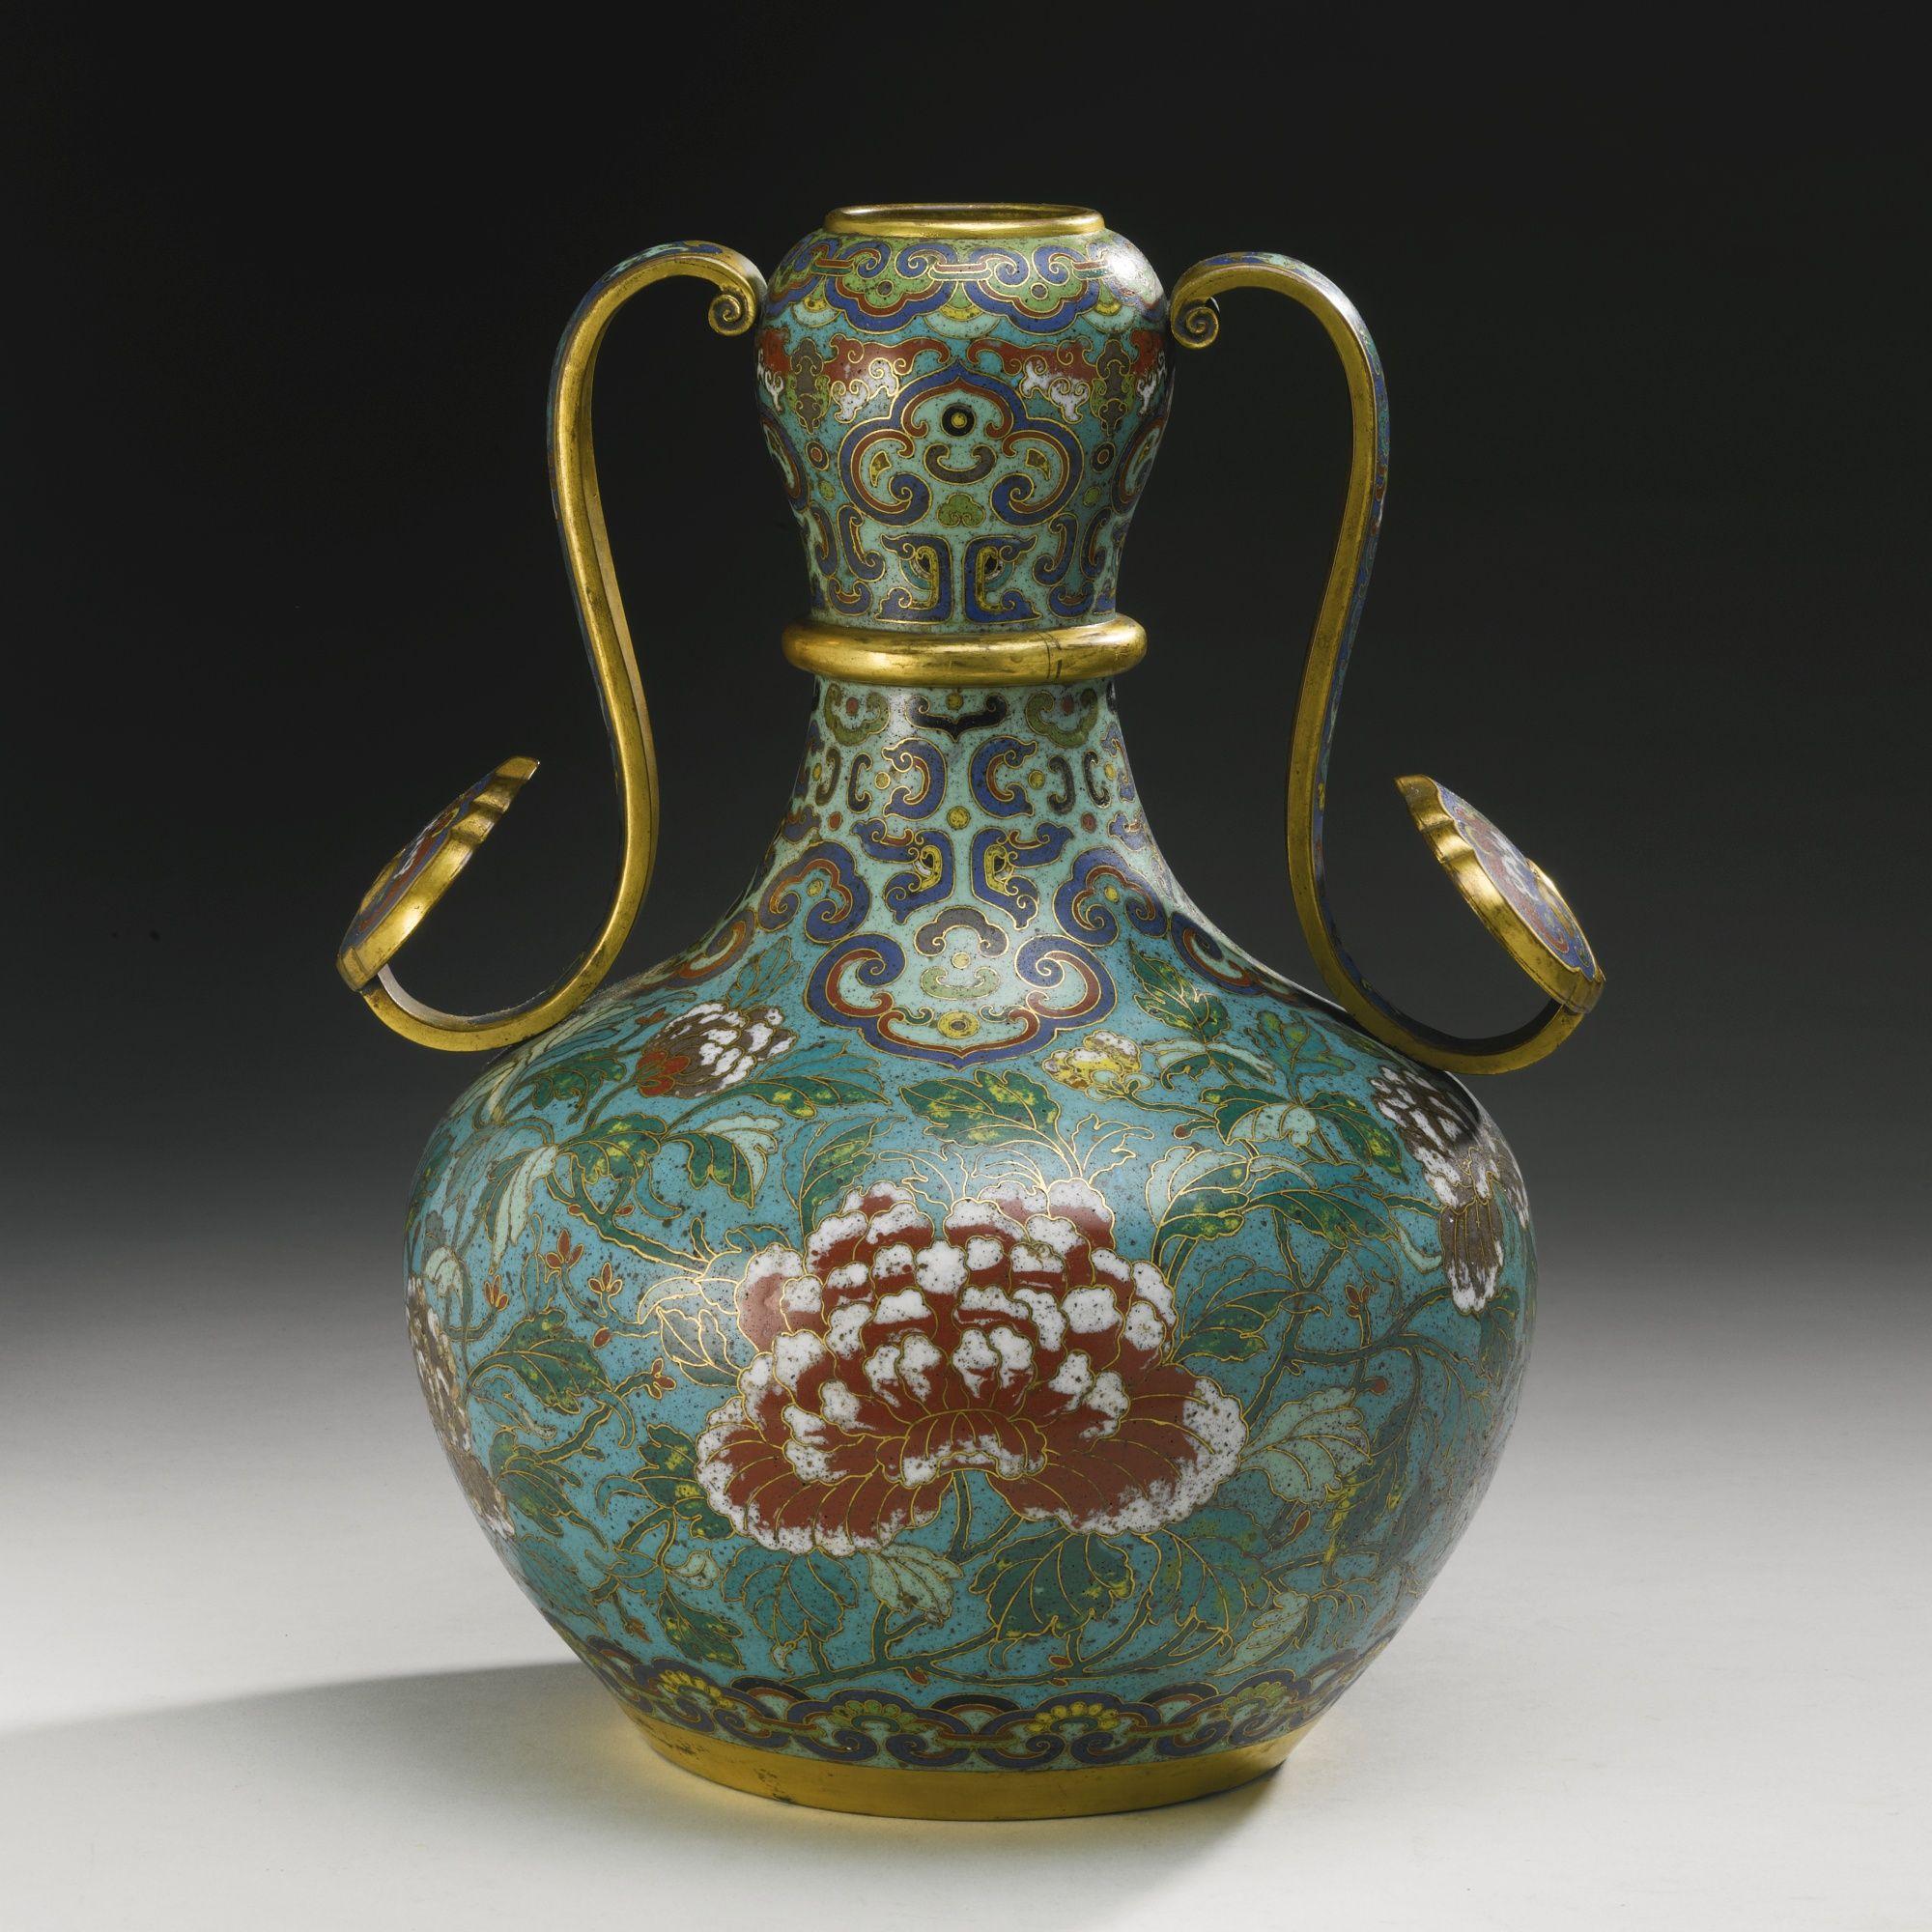 An unusual cloisonne enamel vase qing dynasty qianlong period an unusual cloisonne enamel vase qing dynasty qianlong period sothebys reviewsmspy